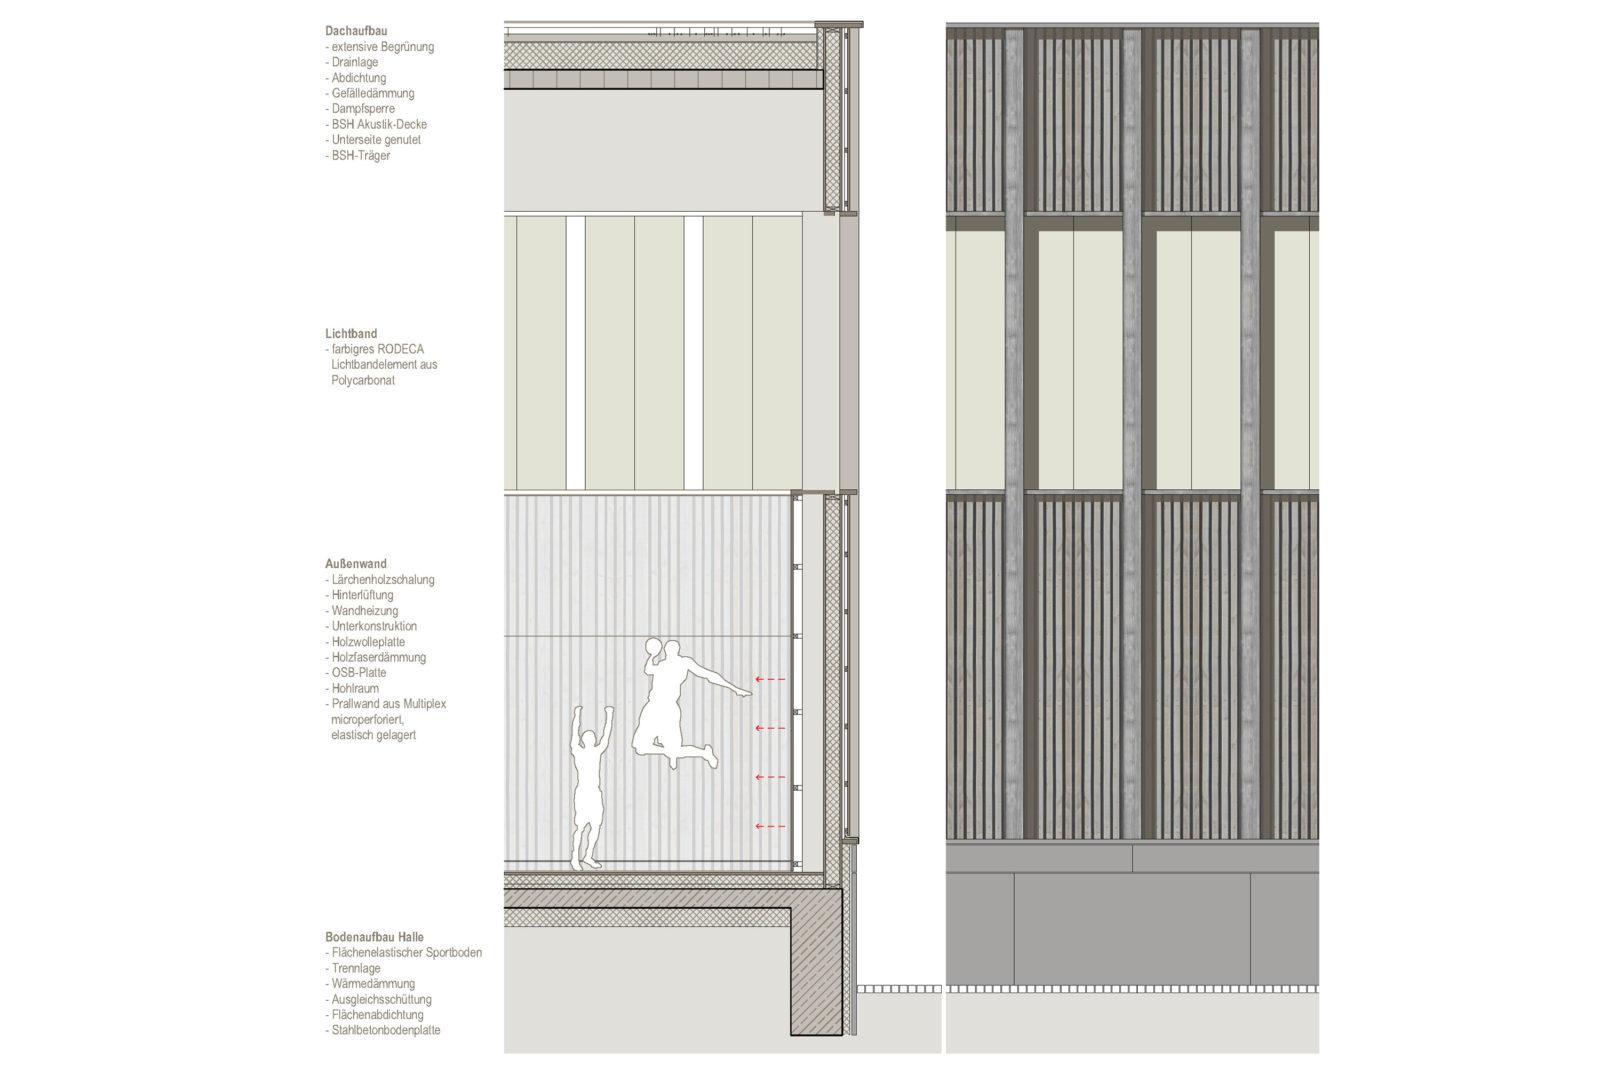 Neubau Sporthalle Pirmasens - Fassadendetail